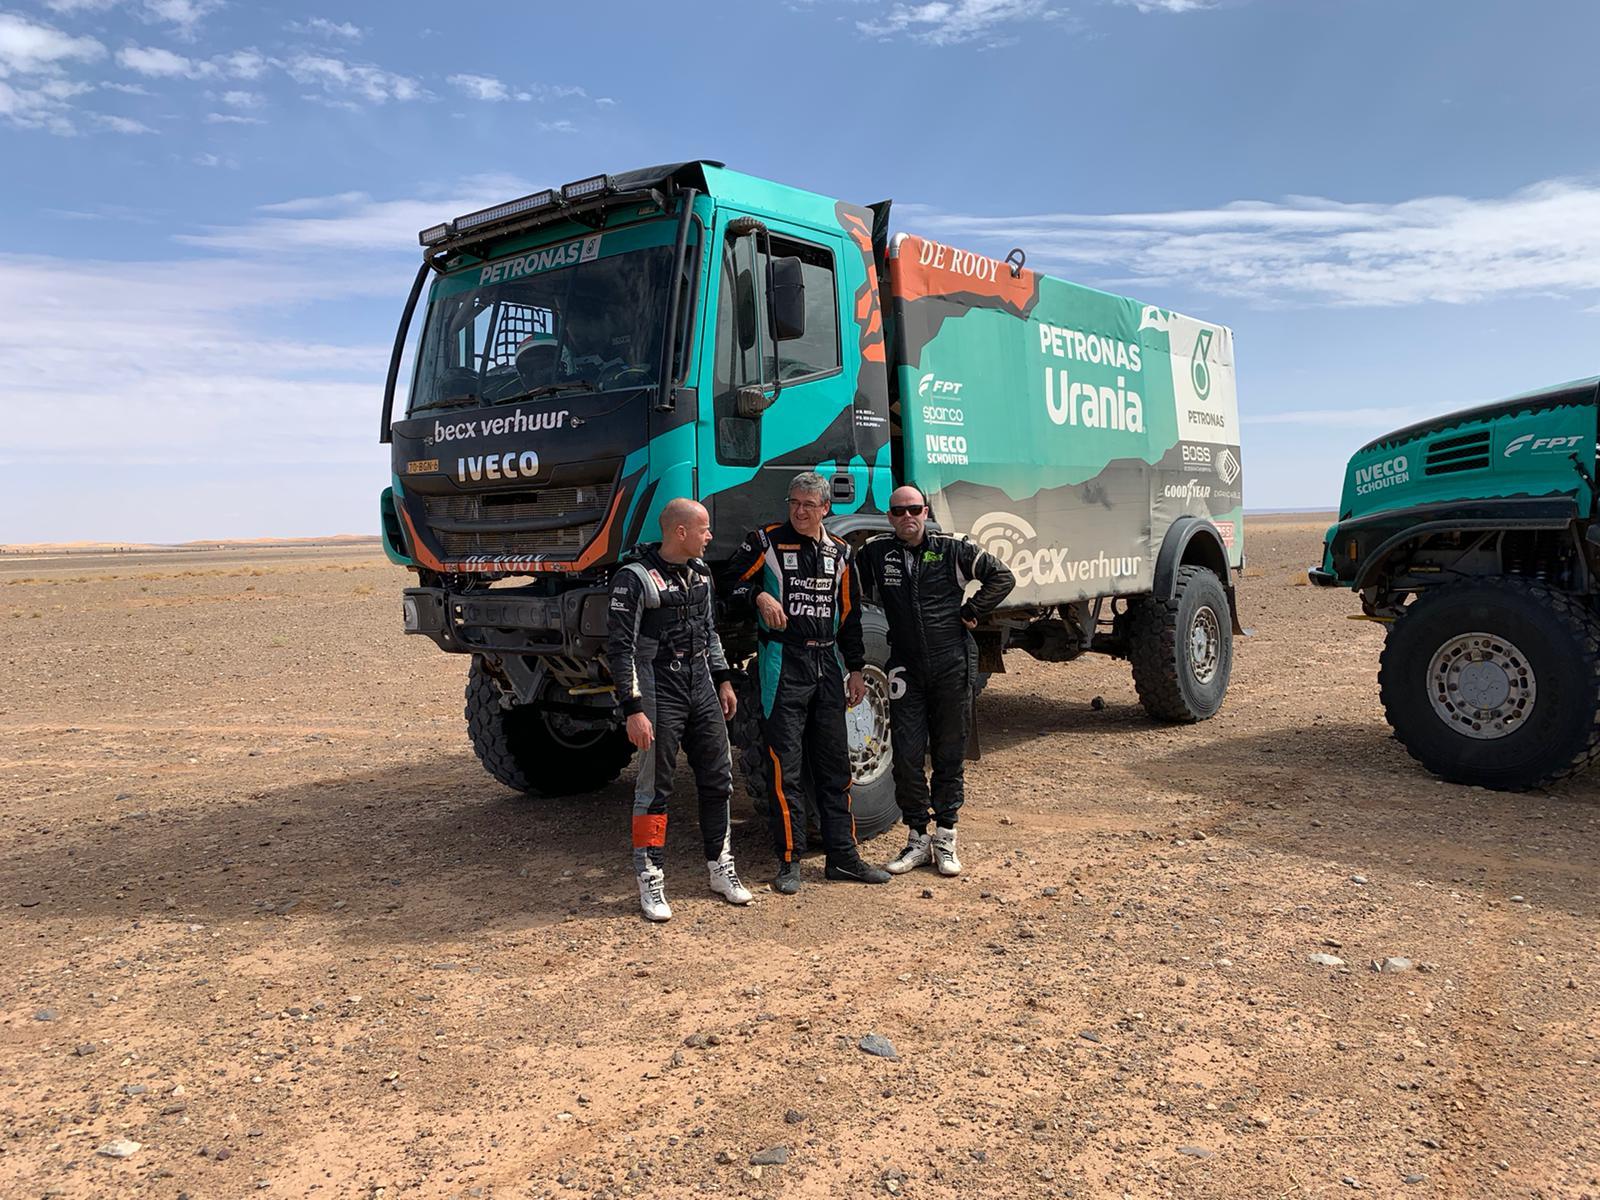 Marokko test voor Dakar